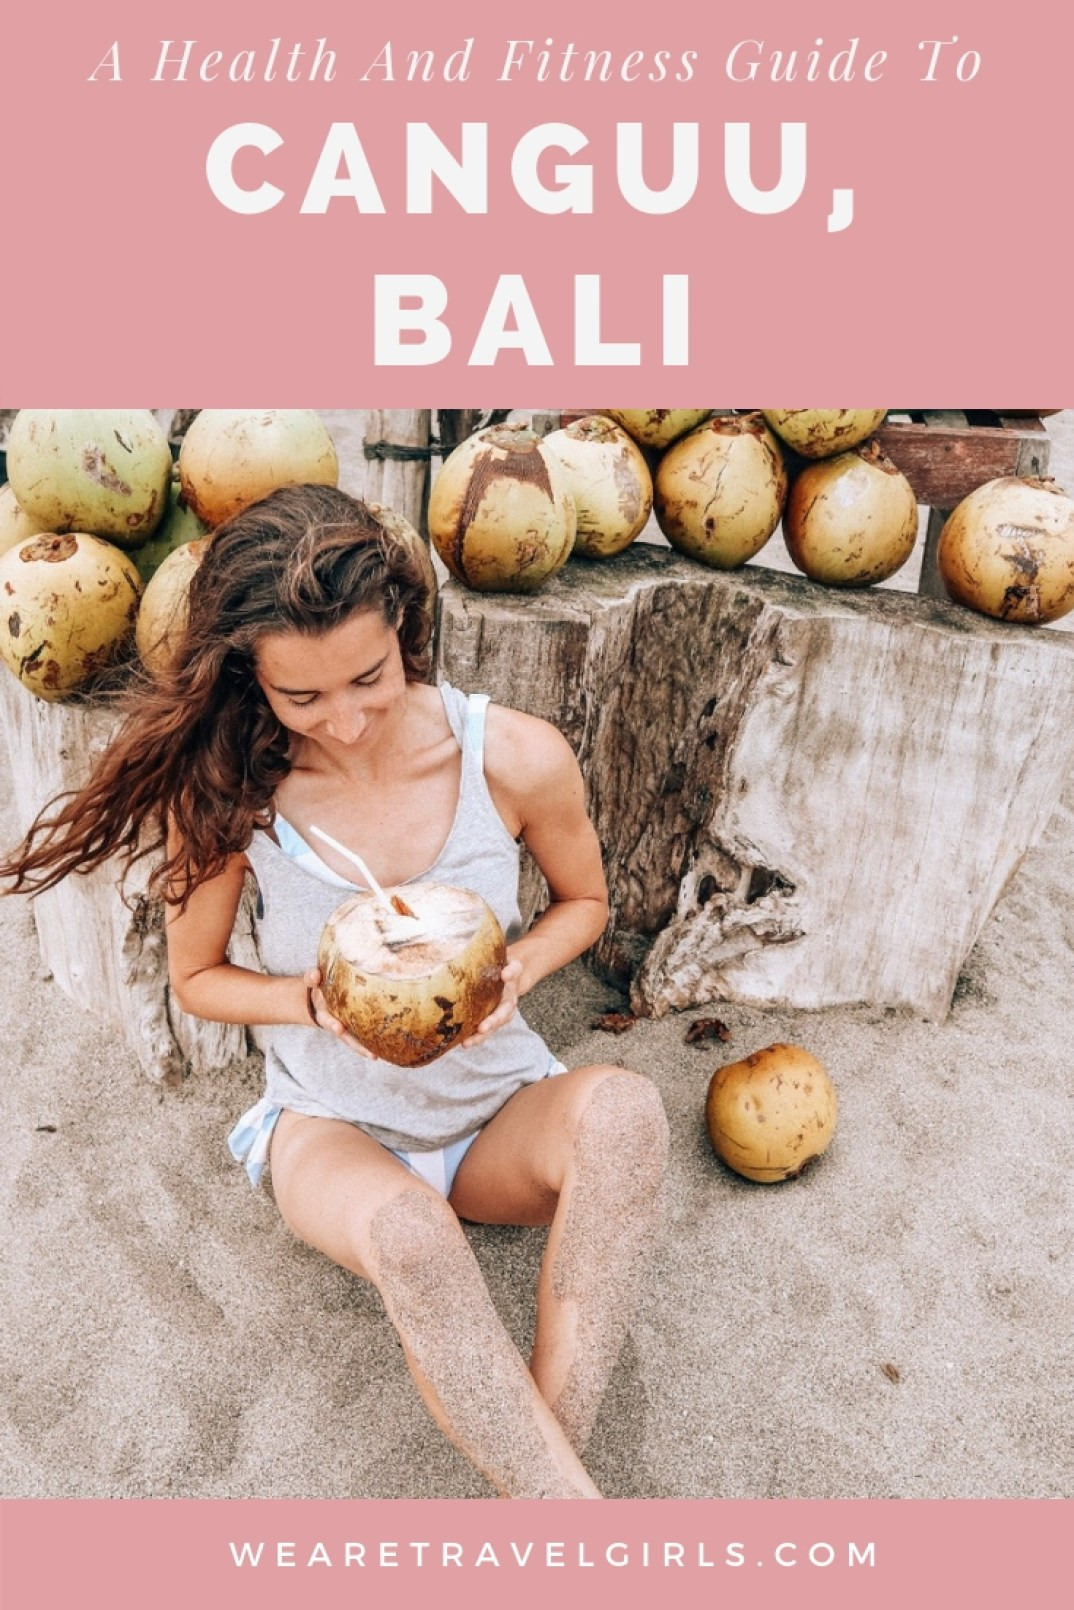 A Health And Fitness Guide To Canguu, Bali